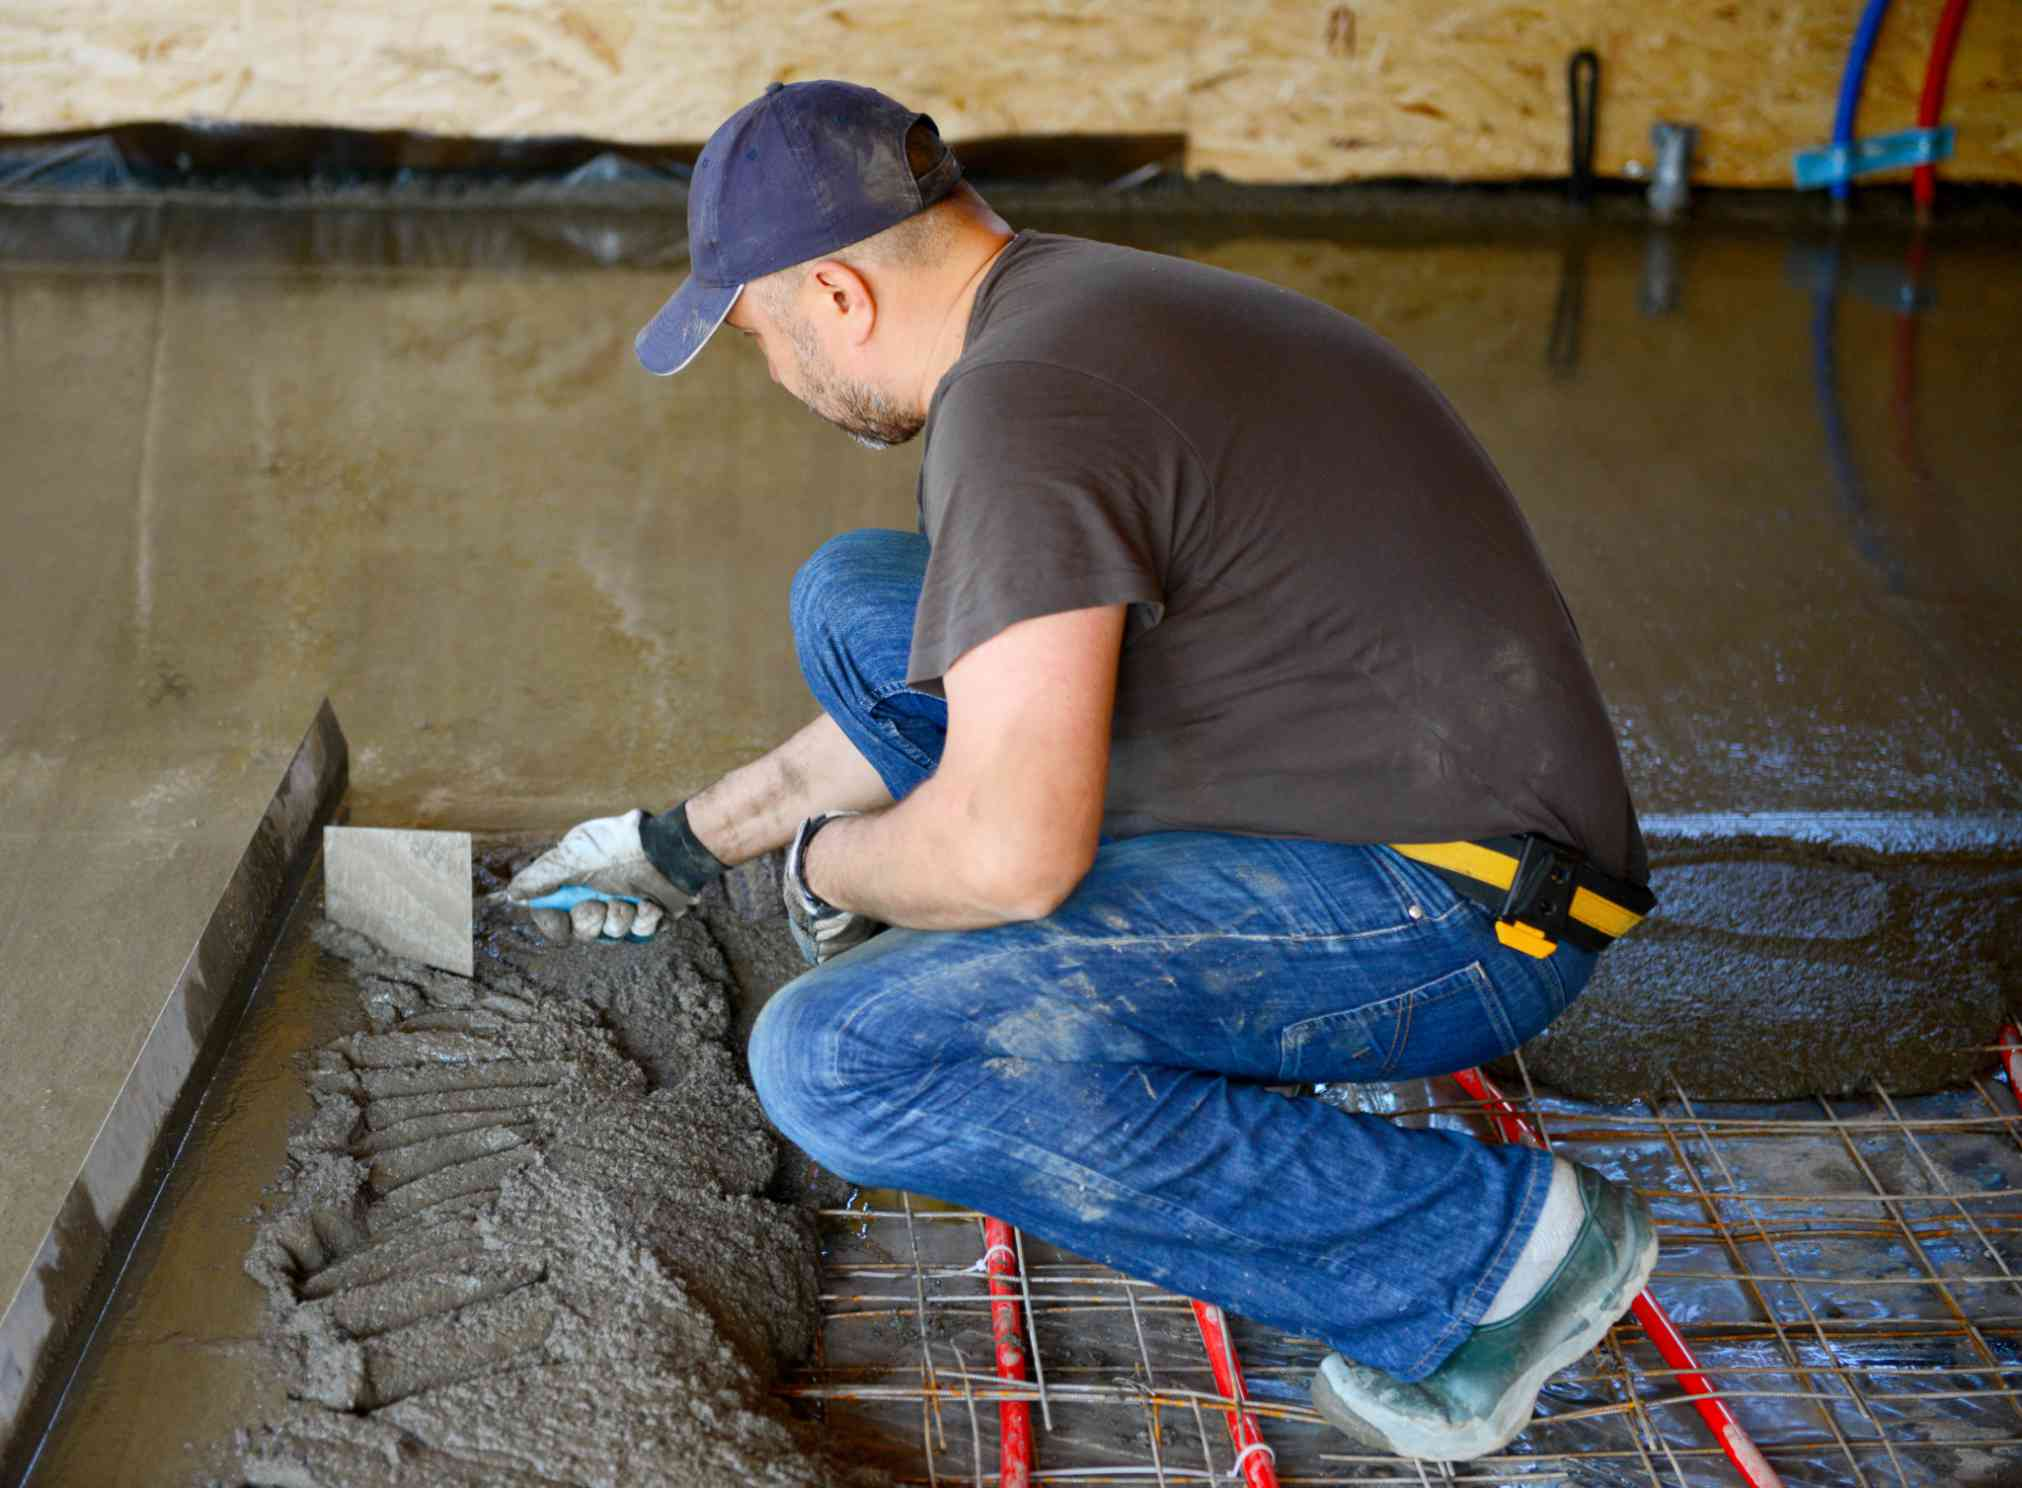 Worker installing plumbing in concrete slab